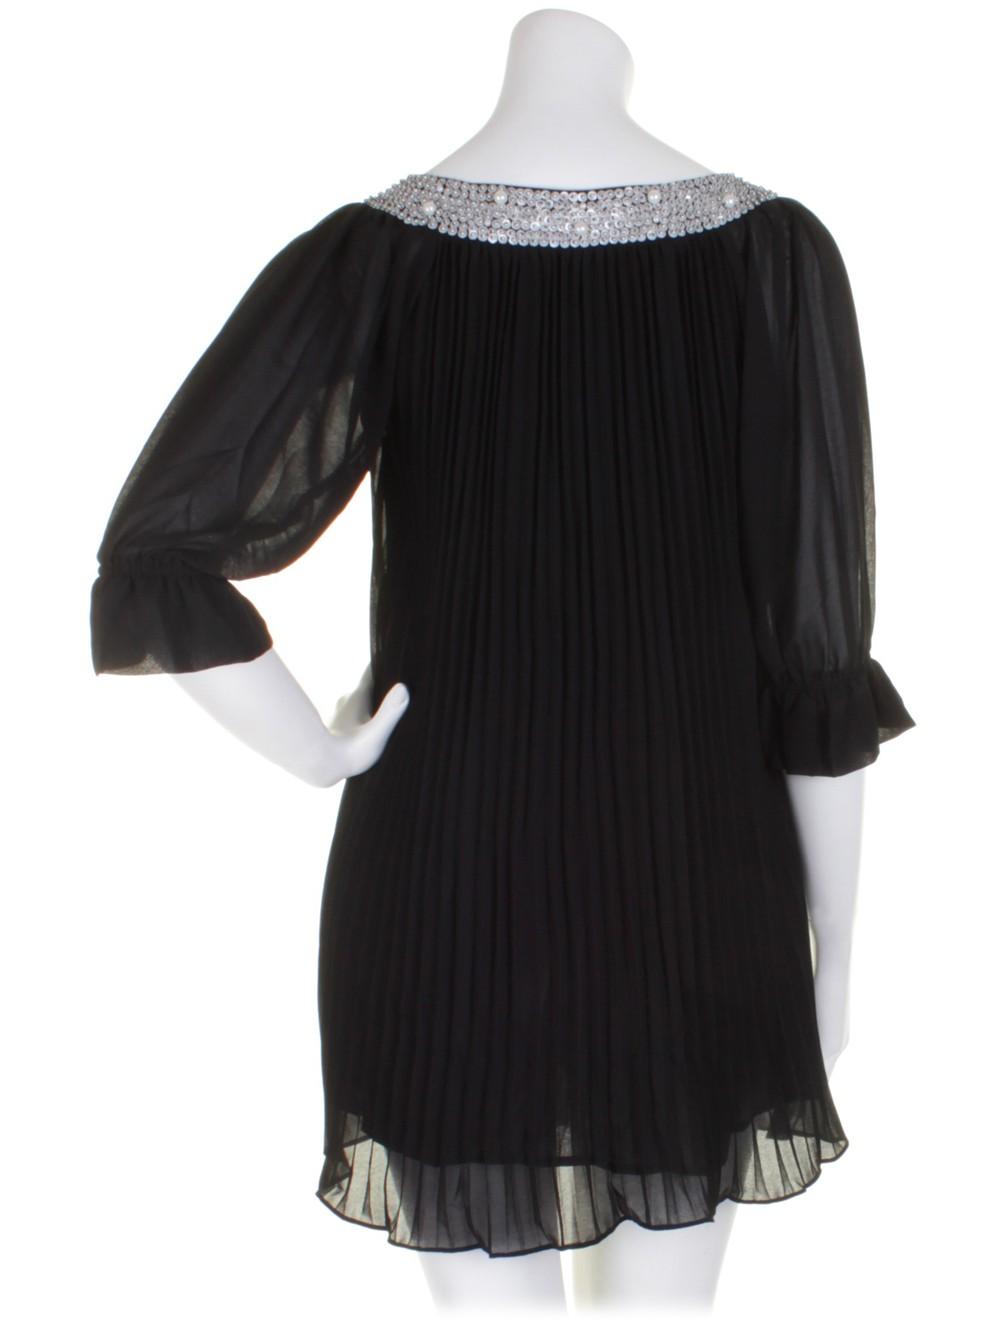 a90cbc8282 Darling Sequin Pearl Neck Grace Dress Top S-XL UK 10-16 RRP  69 ...